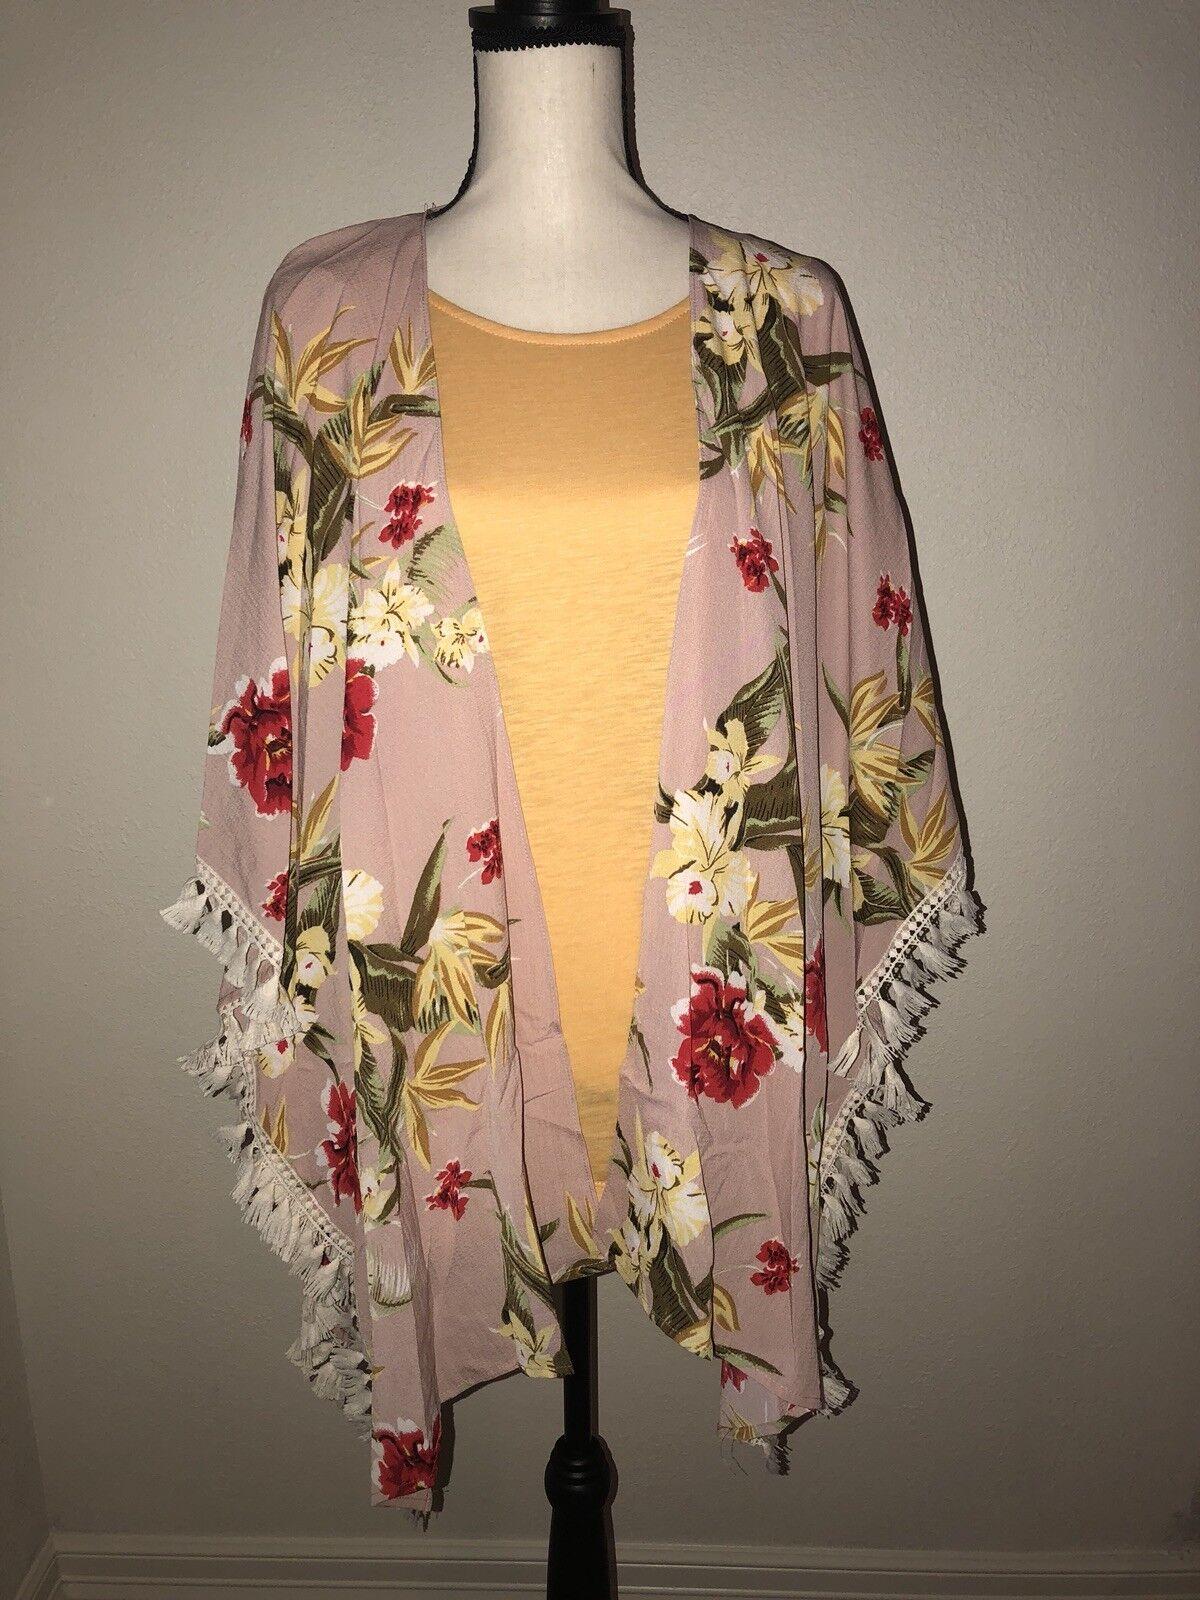 NWT Boutique Umgee Tassel Trim Kimono - Floral - S M